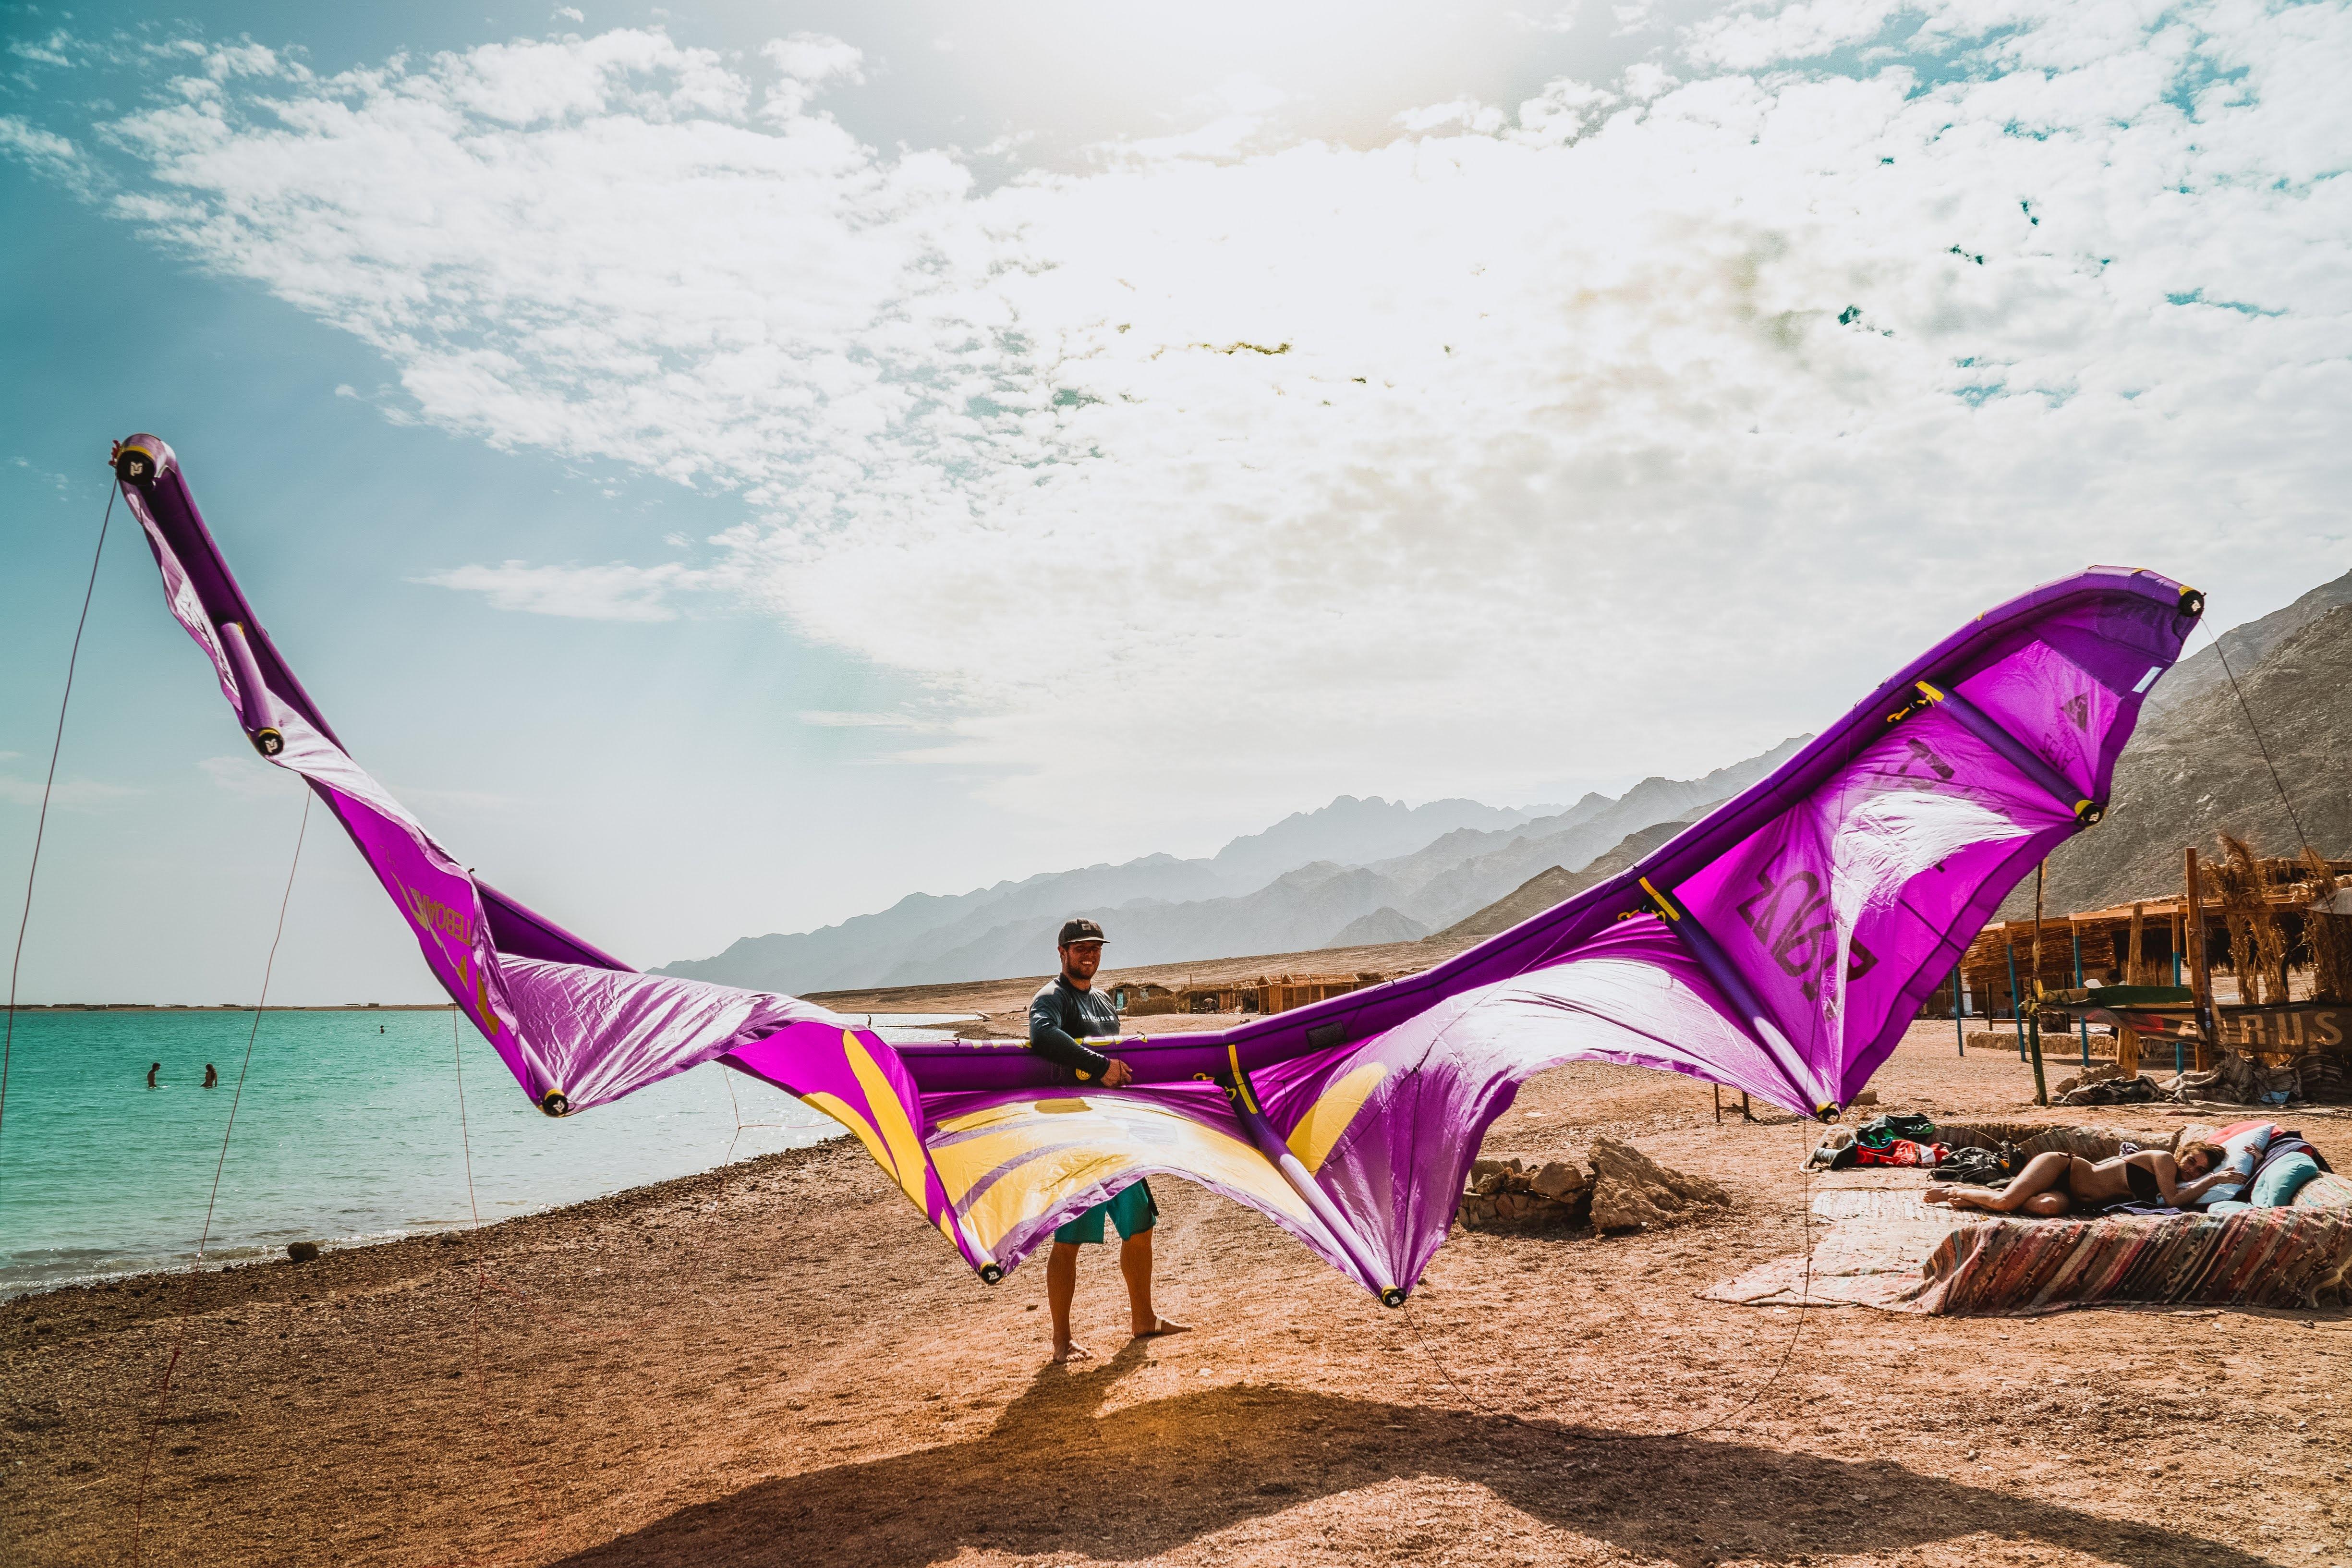 preparing for the kite session